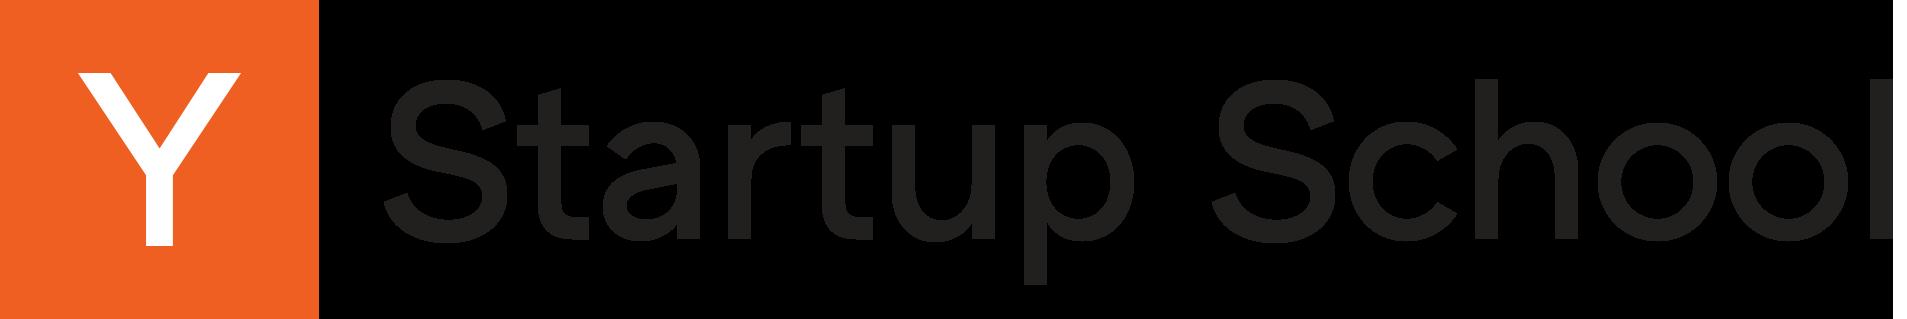 y-startup-école